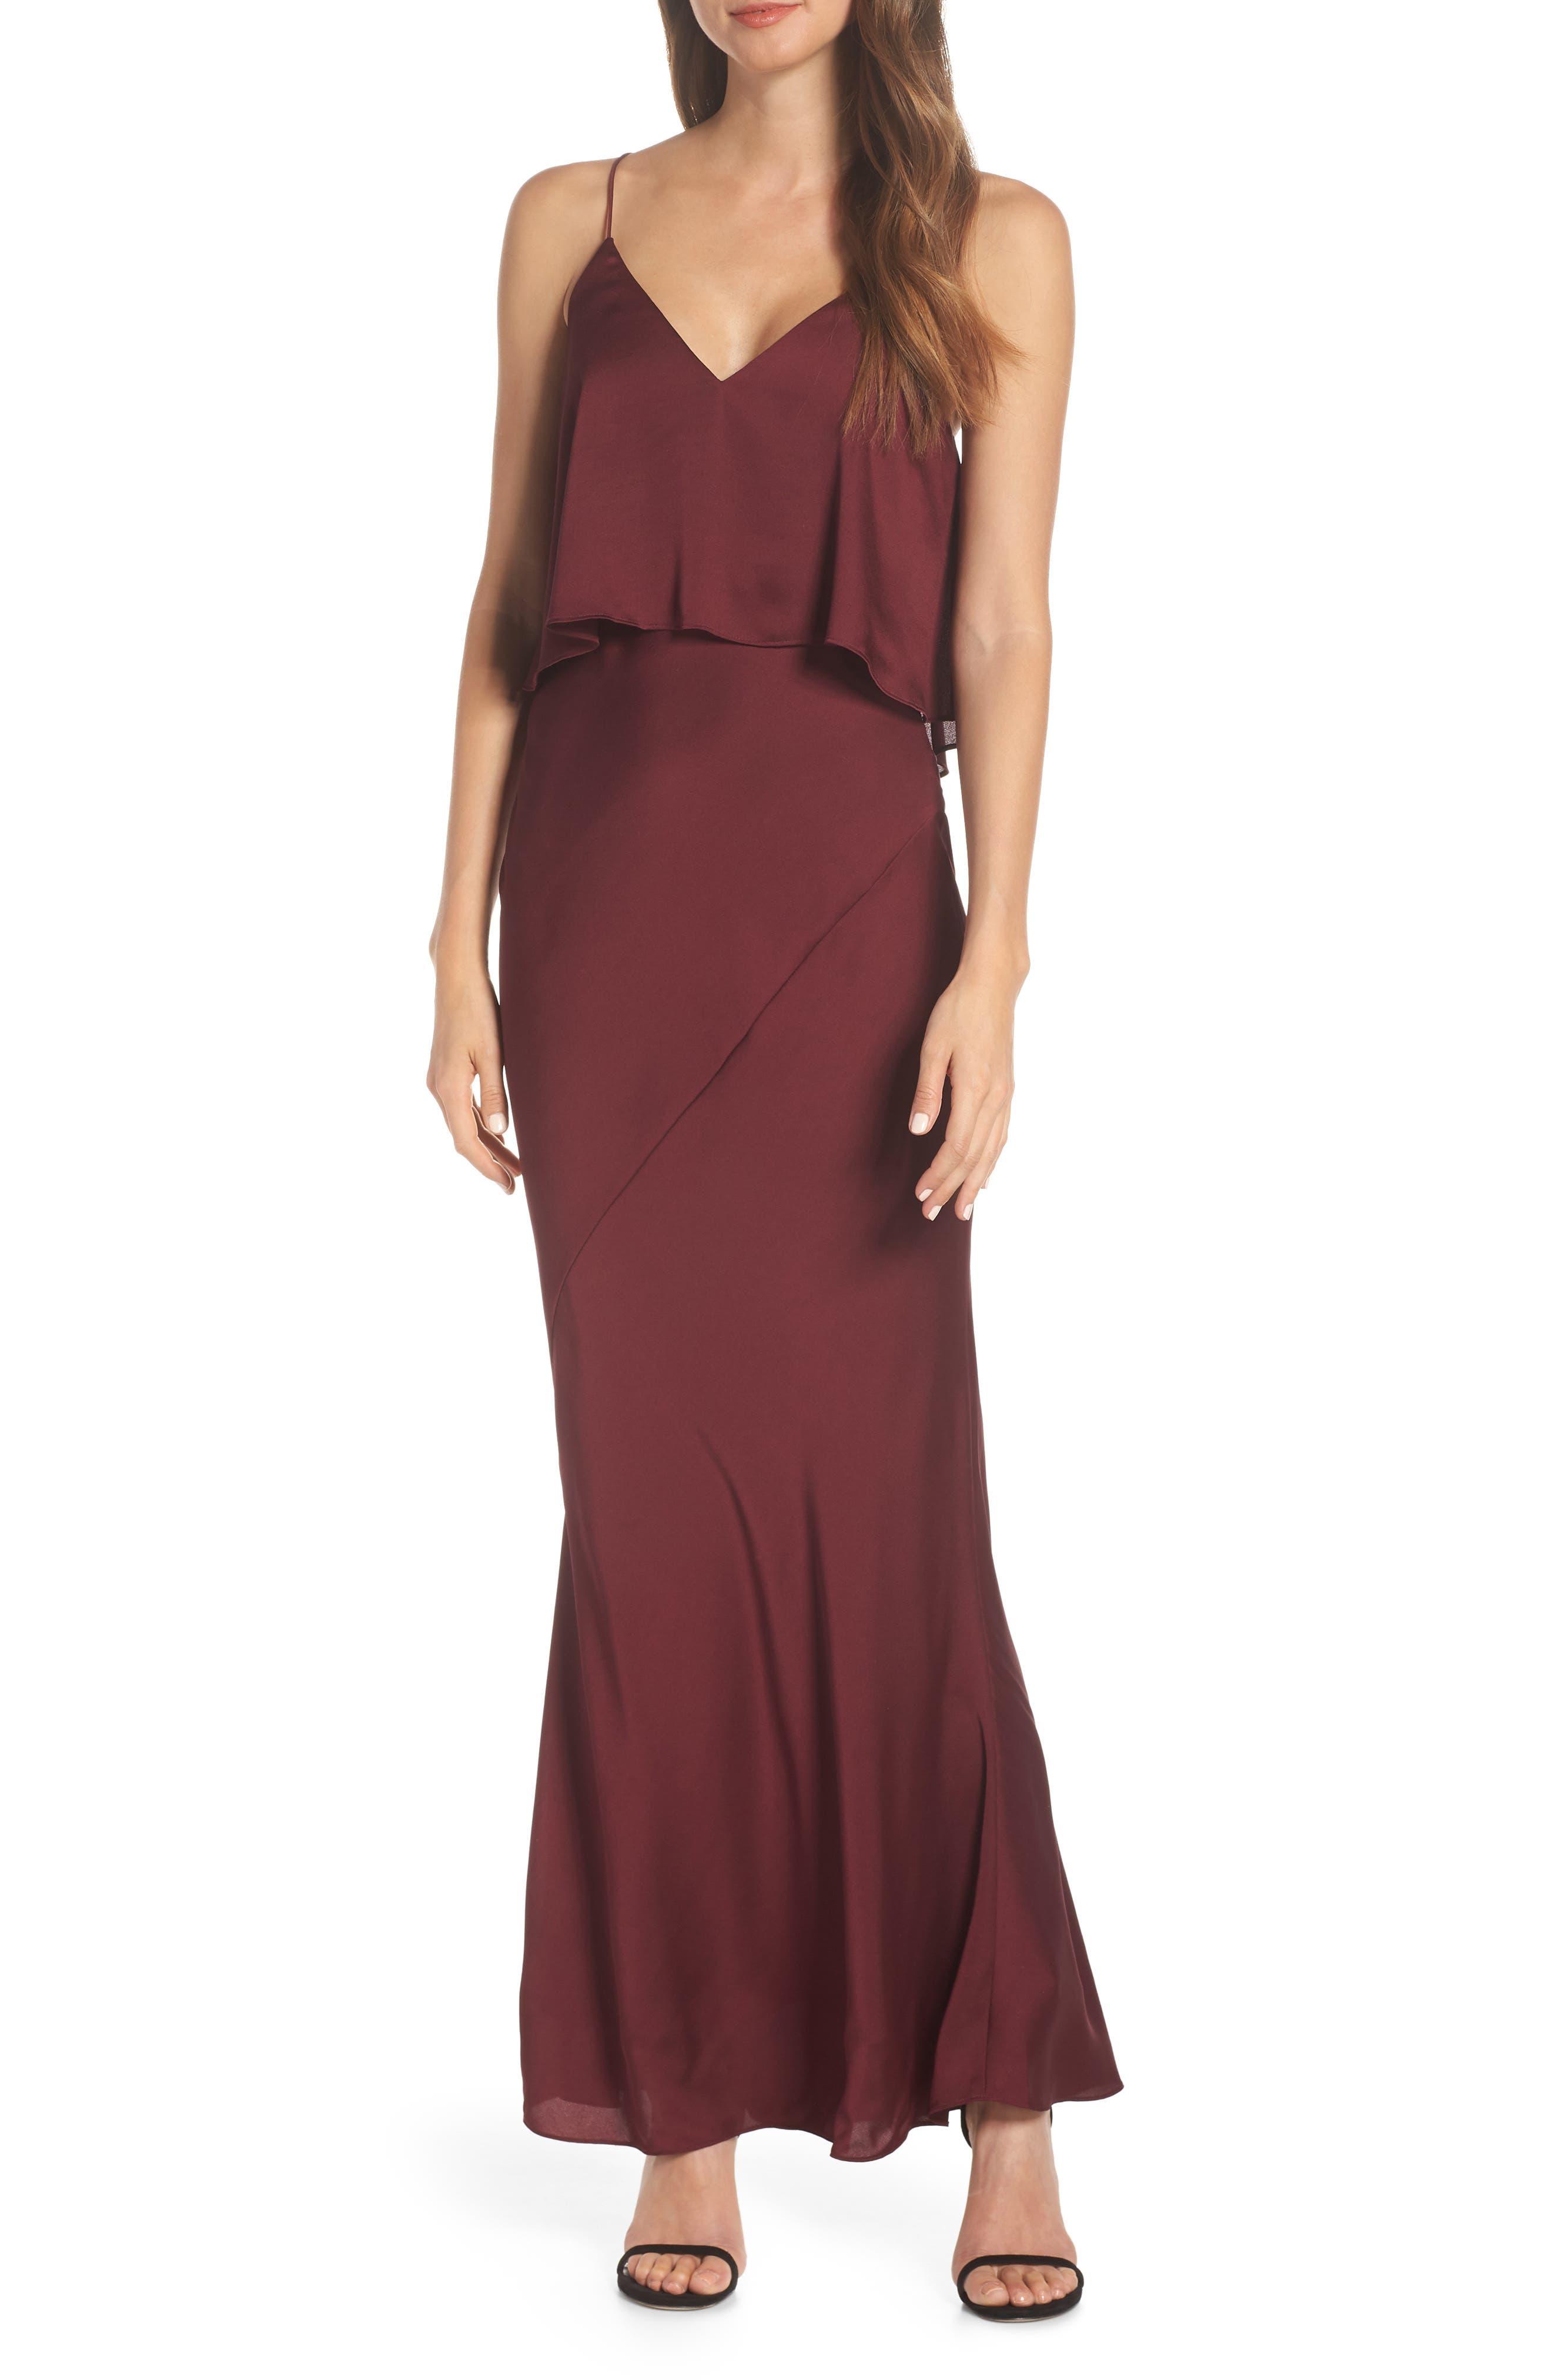 SHONA JOY Luxe Frilled Bodice Bias Cut Gown in Garnet